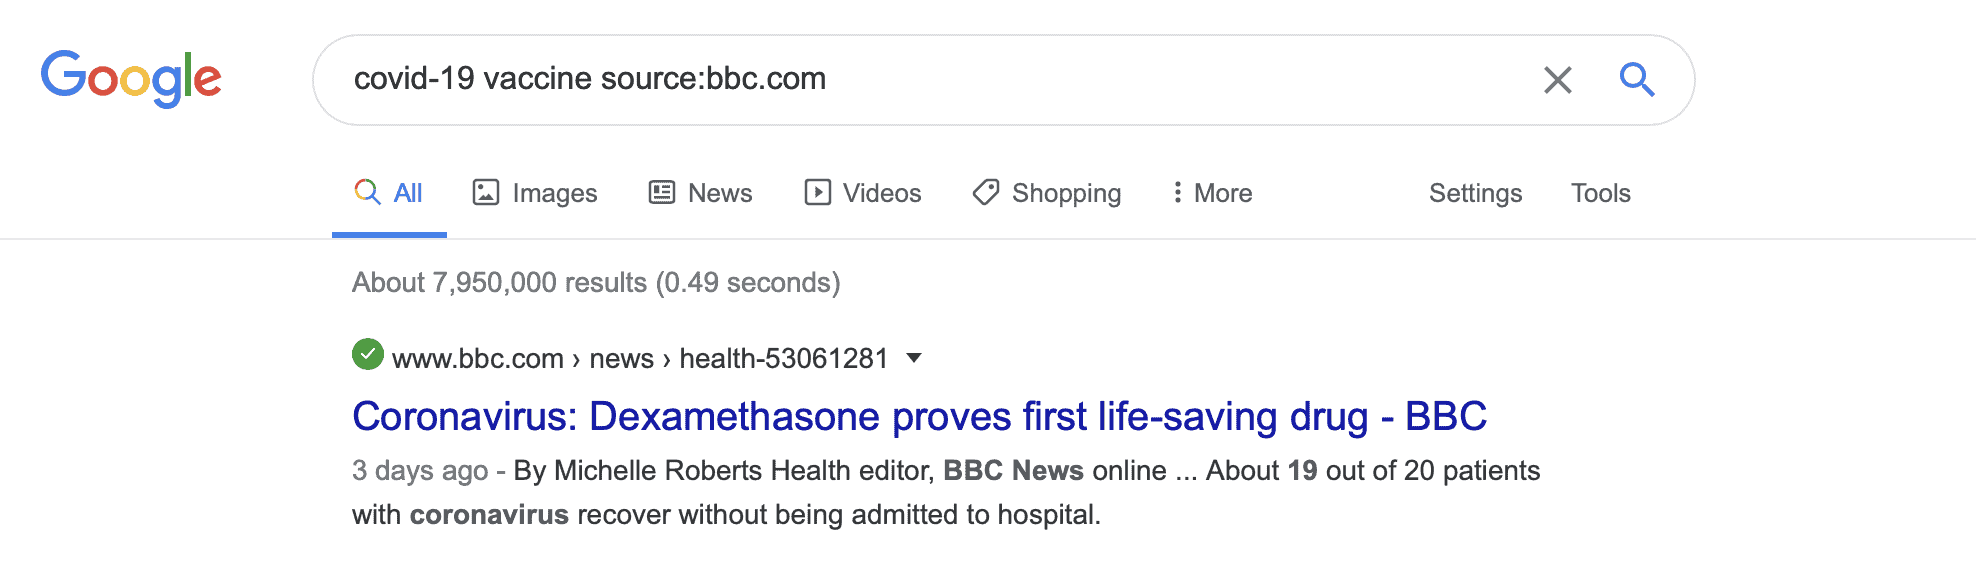 covid 19 vaccine source bbc.com